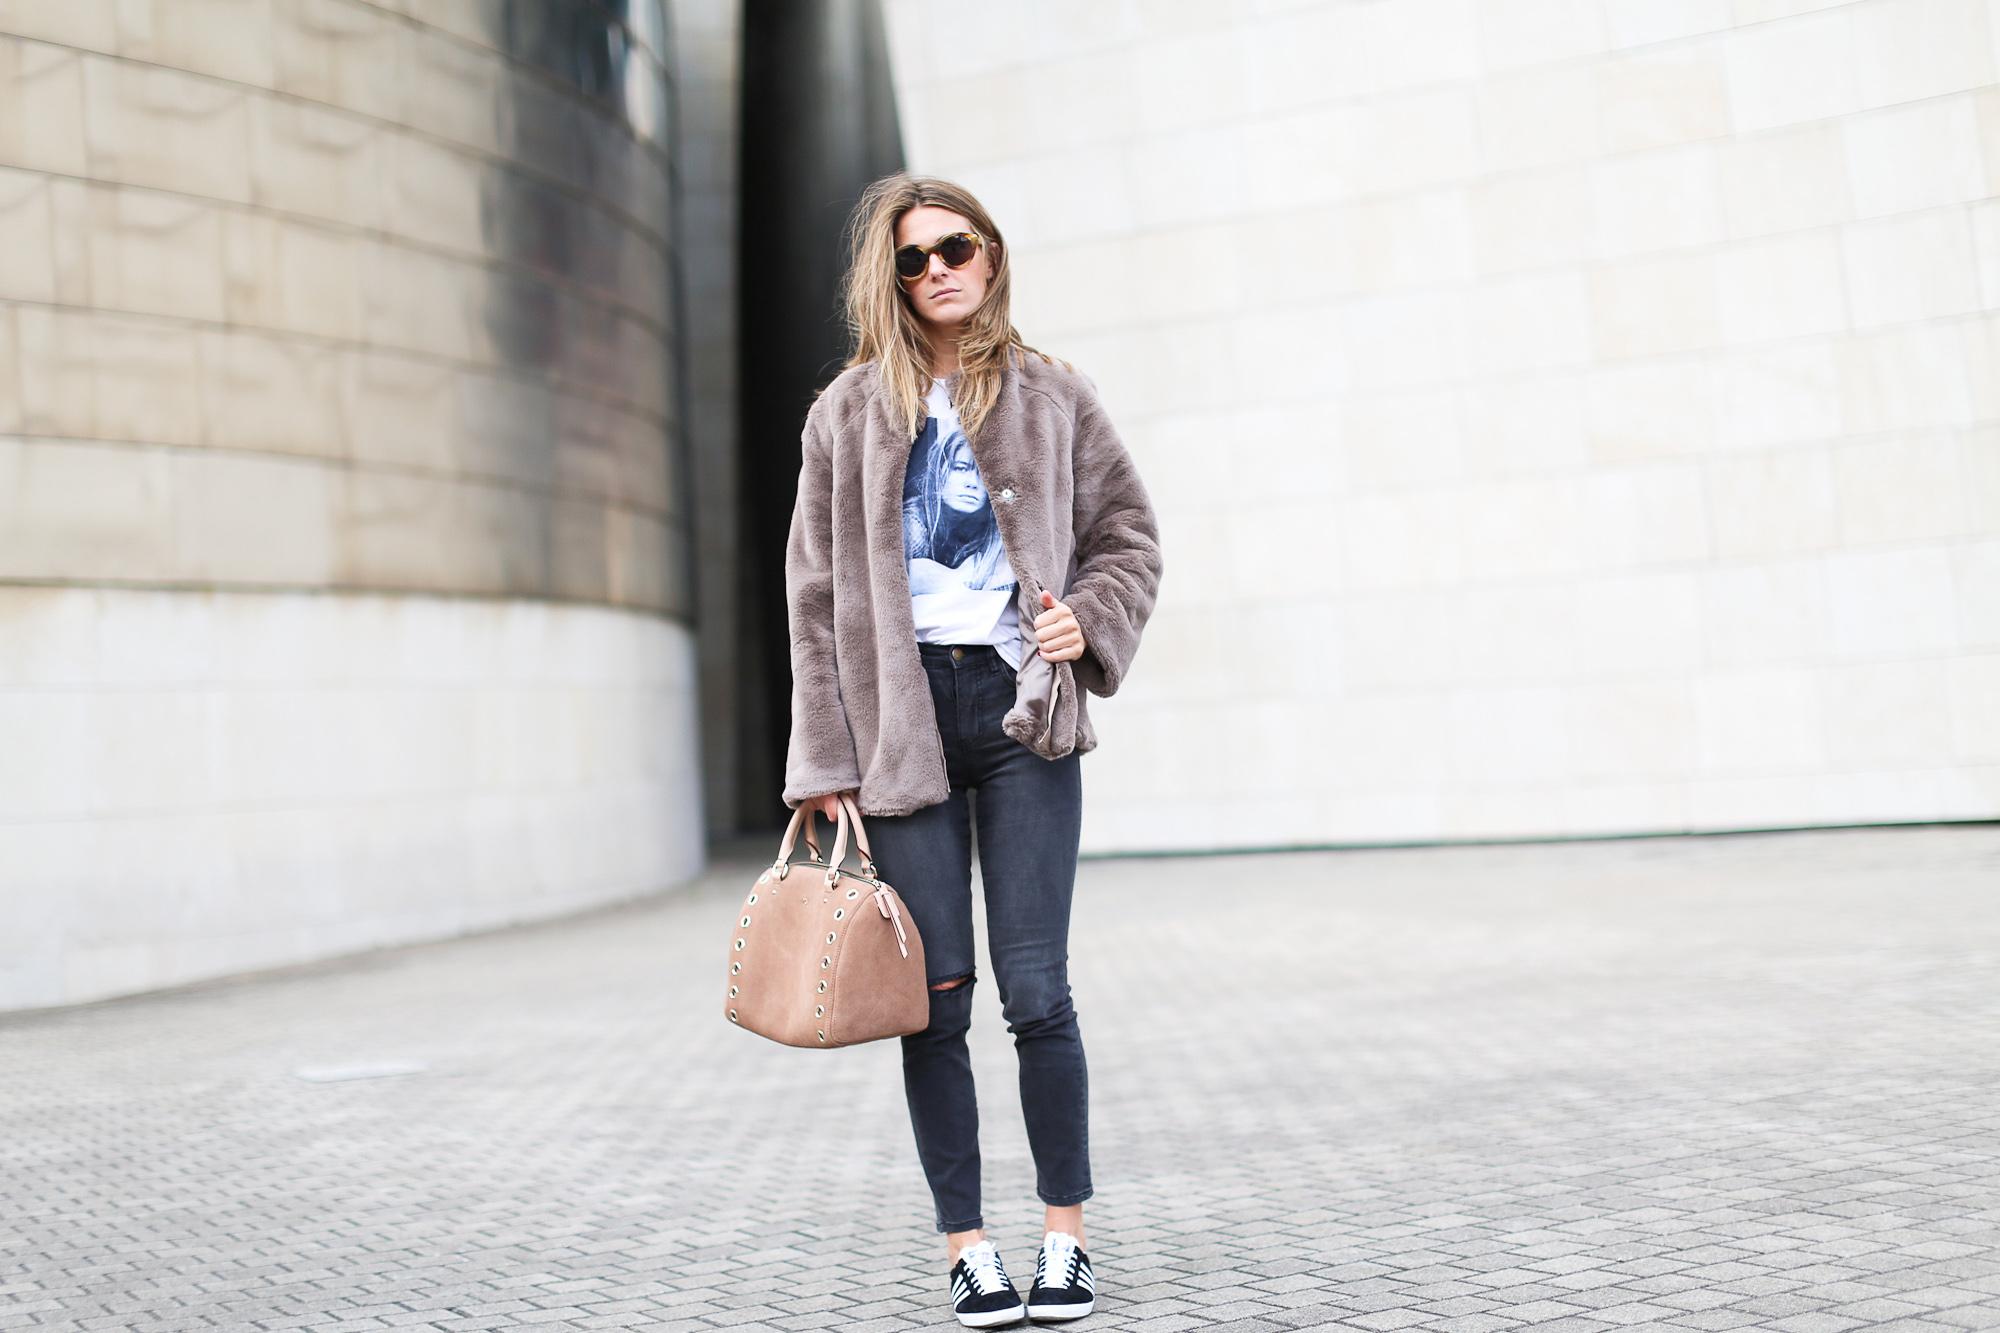 Clochet_streetstyle_fashionblogger_bilbao_guggenheim_purificaciongarcia_bolsoante_adidasgazelle-2